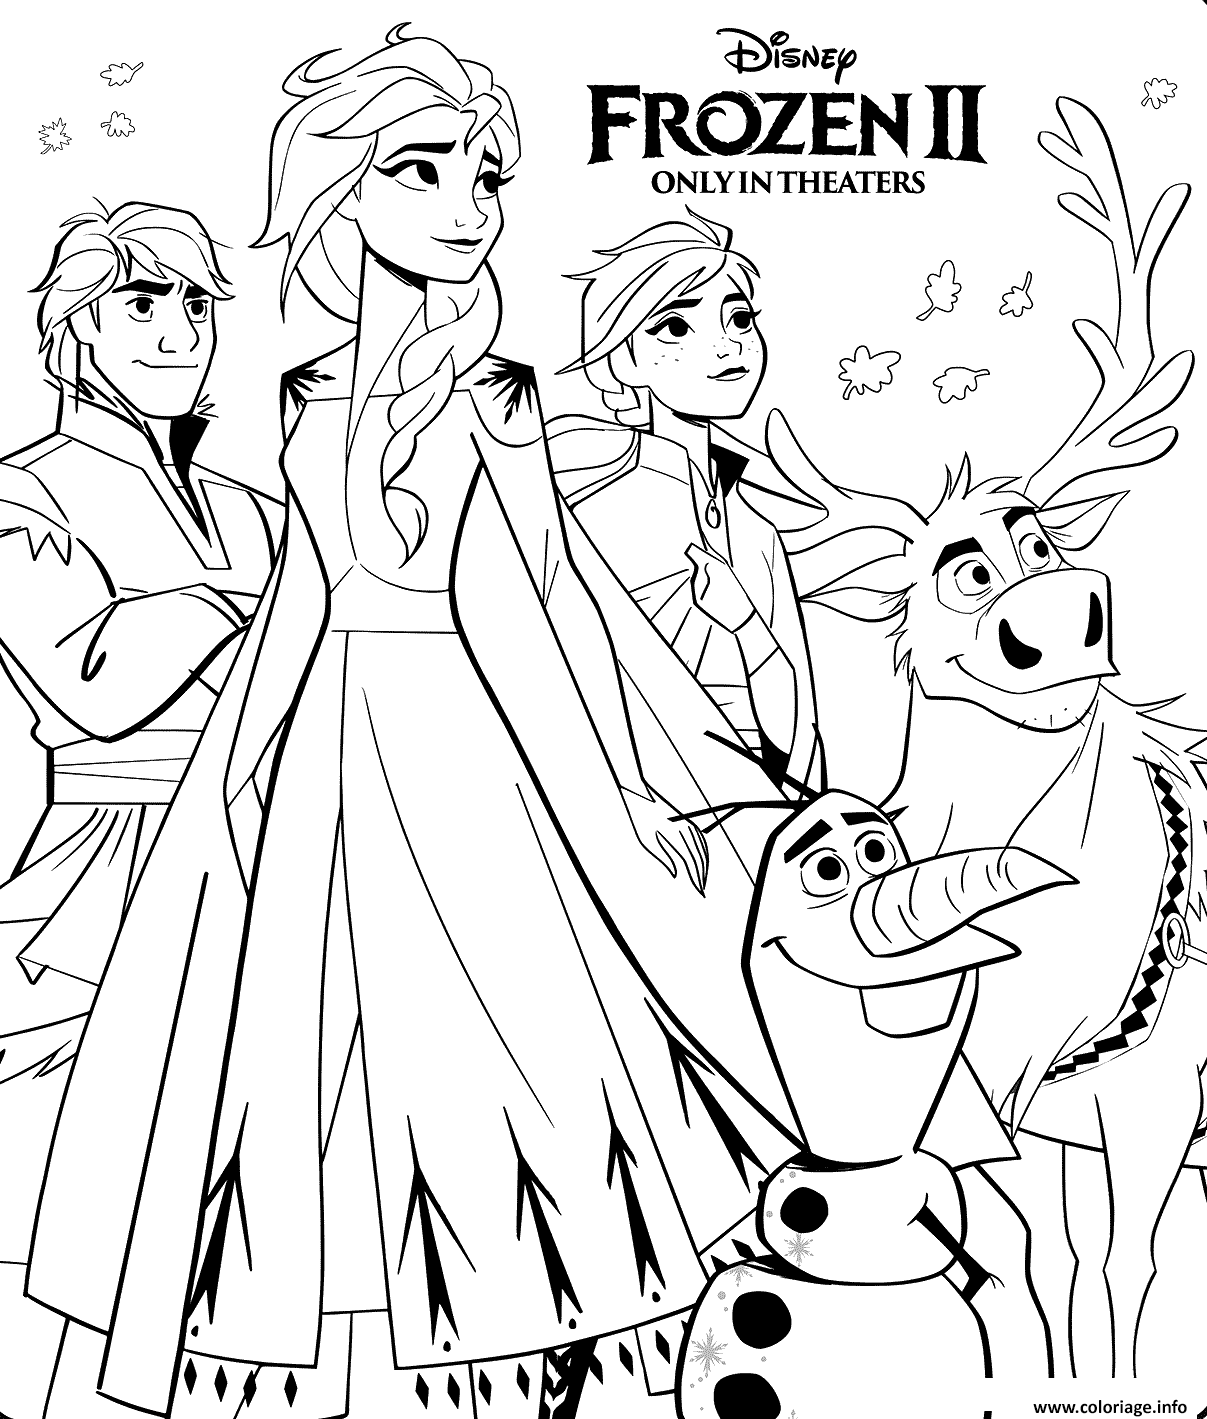 Coloriage Disney Frozen 2 dessin